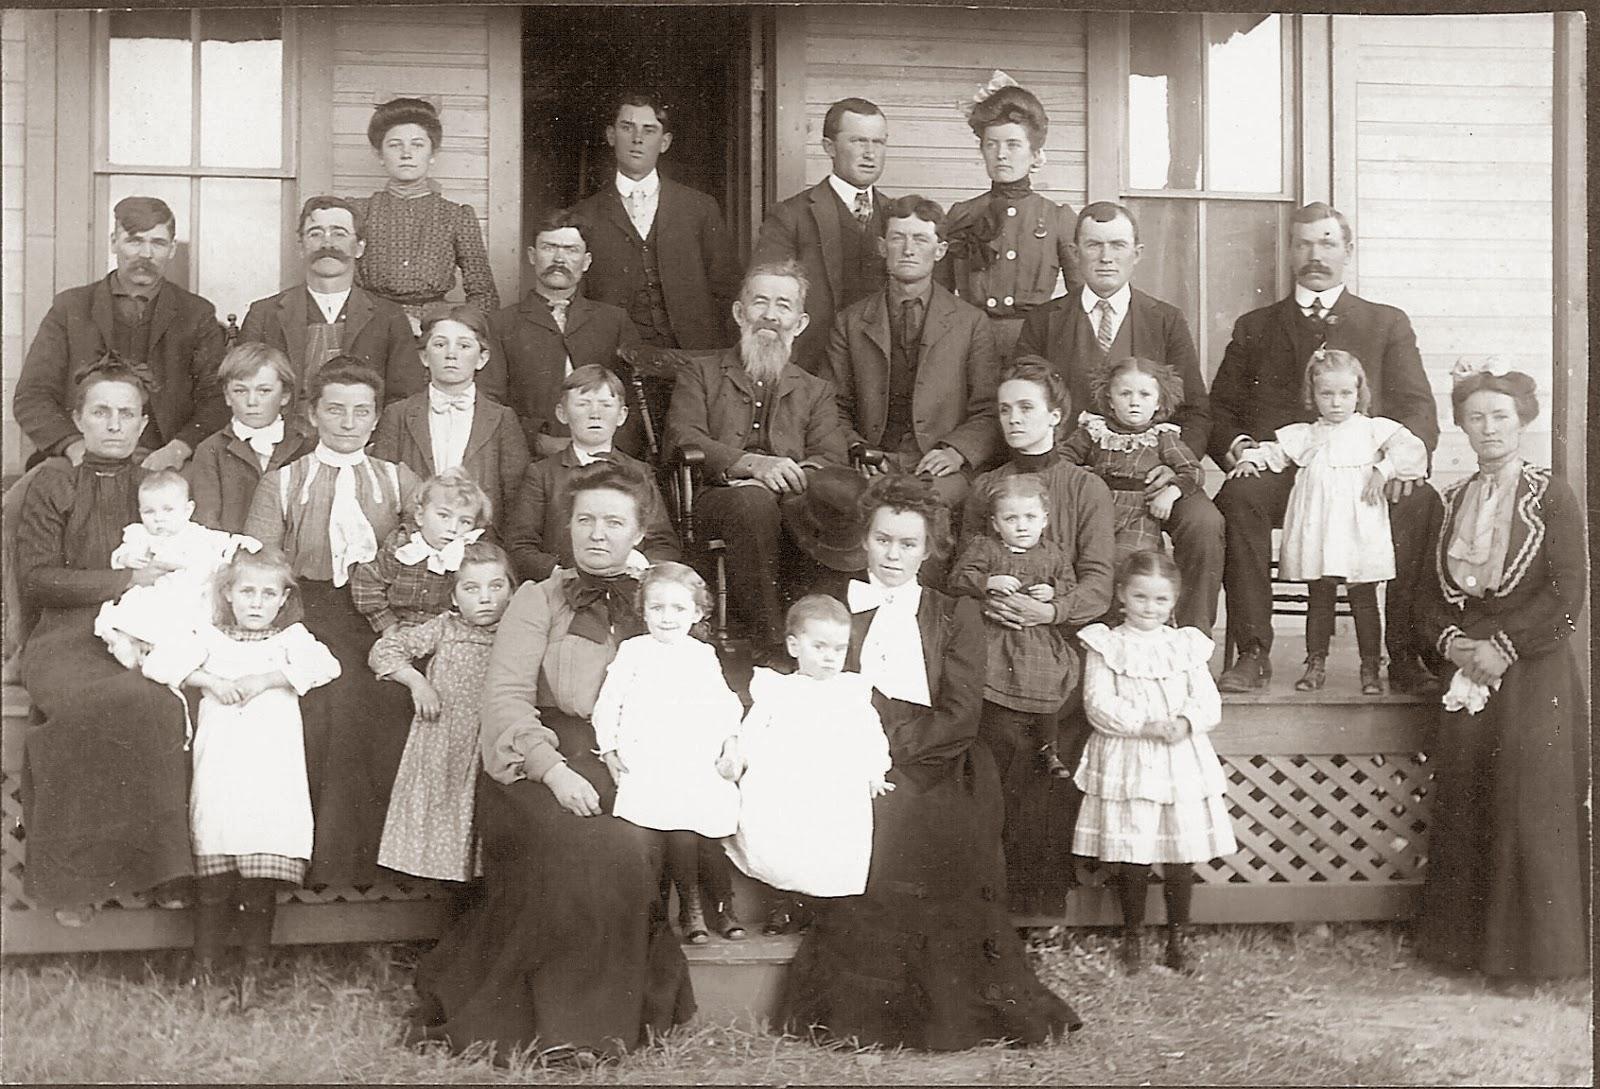 MORRIS-GAMMON FAMILY HISTORY: Pics & Such